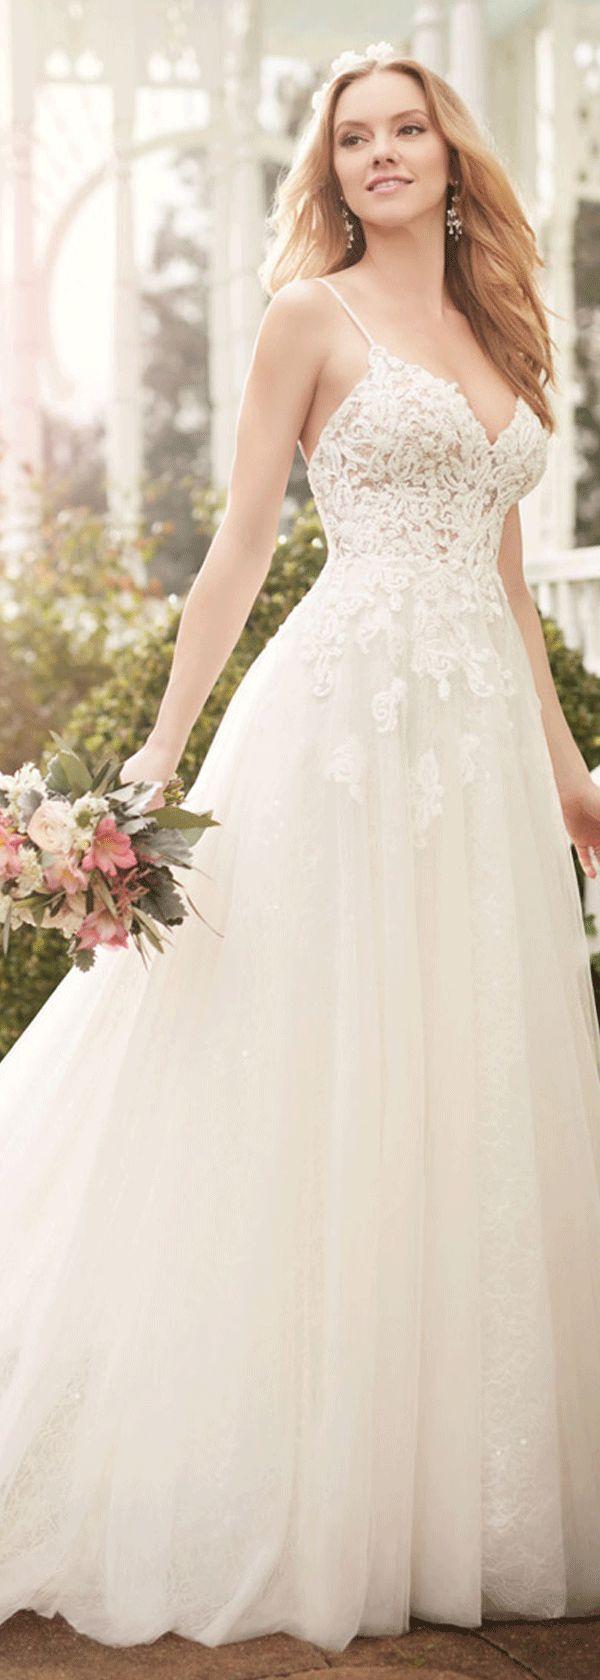 Best 20 Hawaiian wedding dresses ideas on Pinterest  Tropical wedding dresses Hawaii wedding